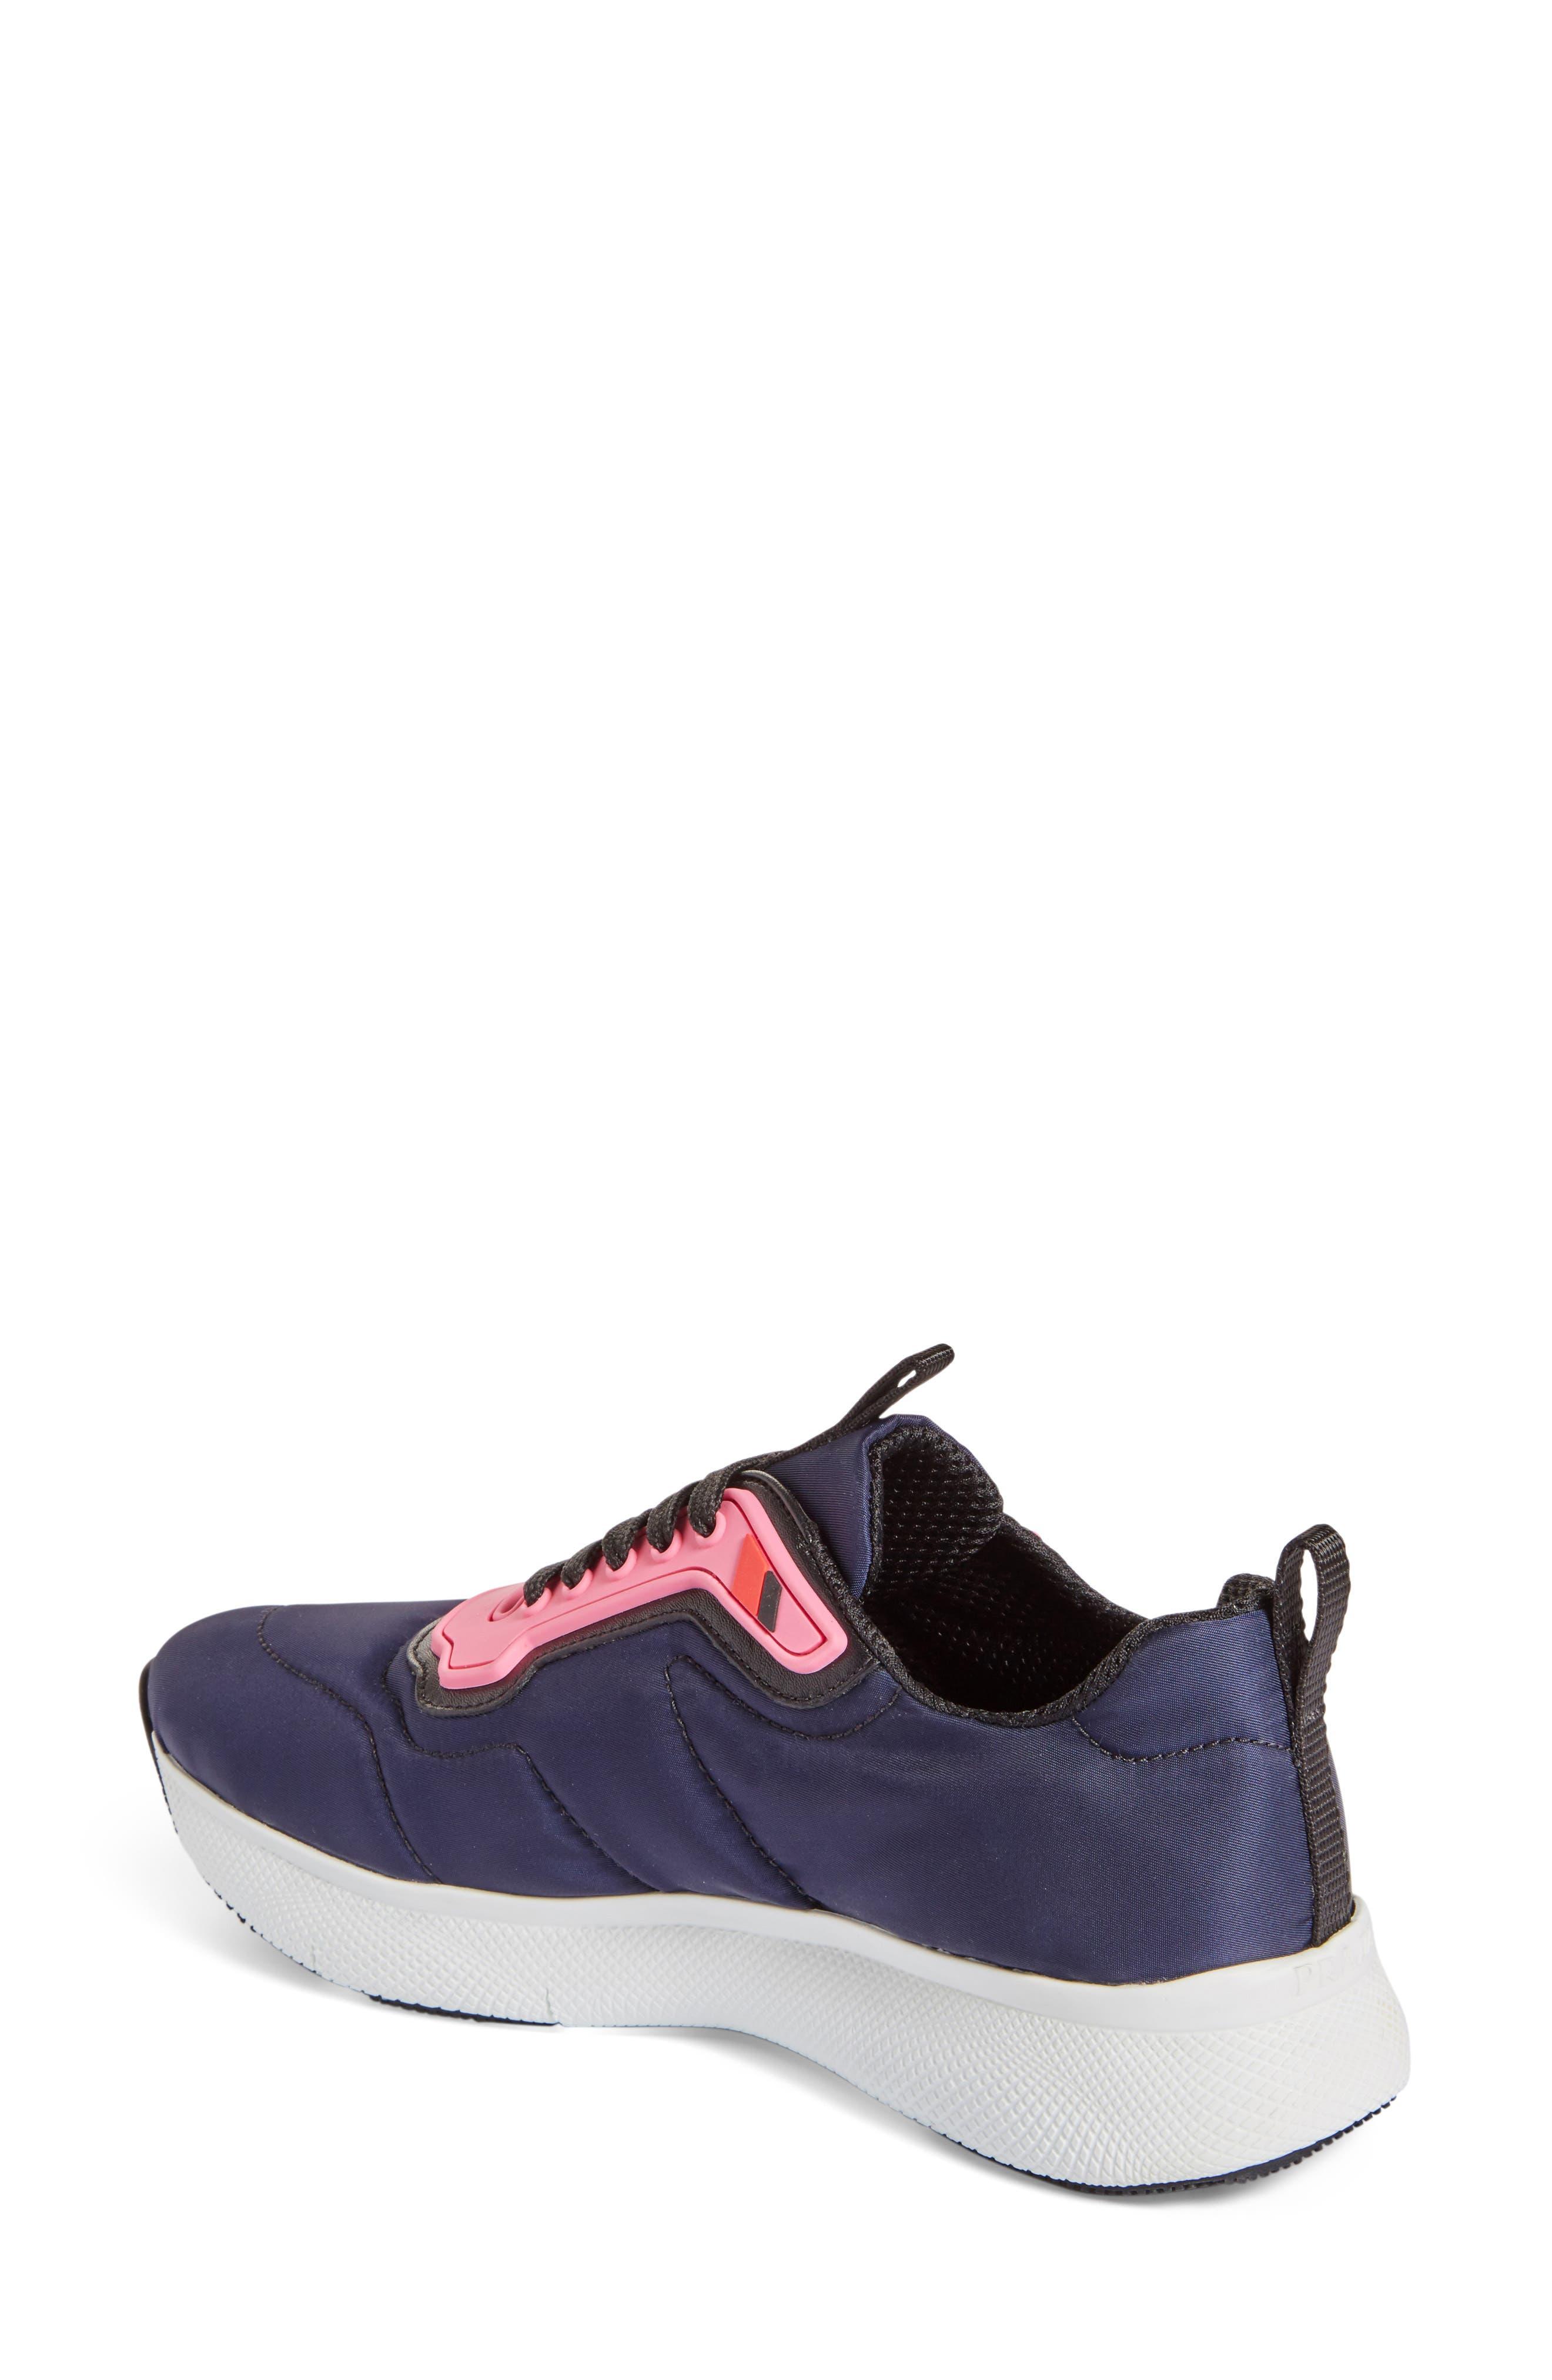 Runner Sneaker,                         Main,                         color, 002